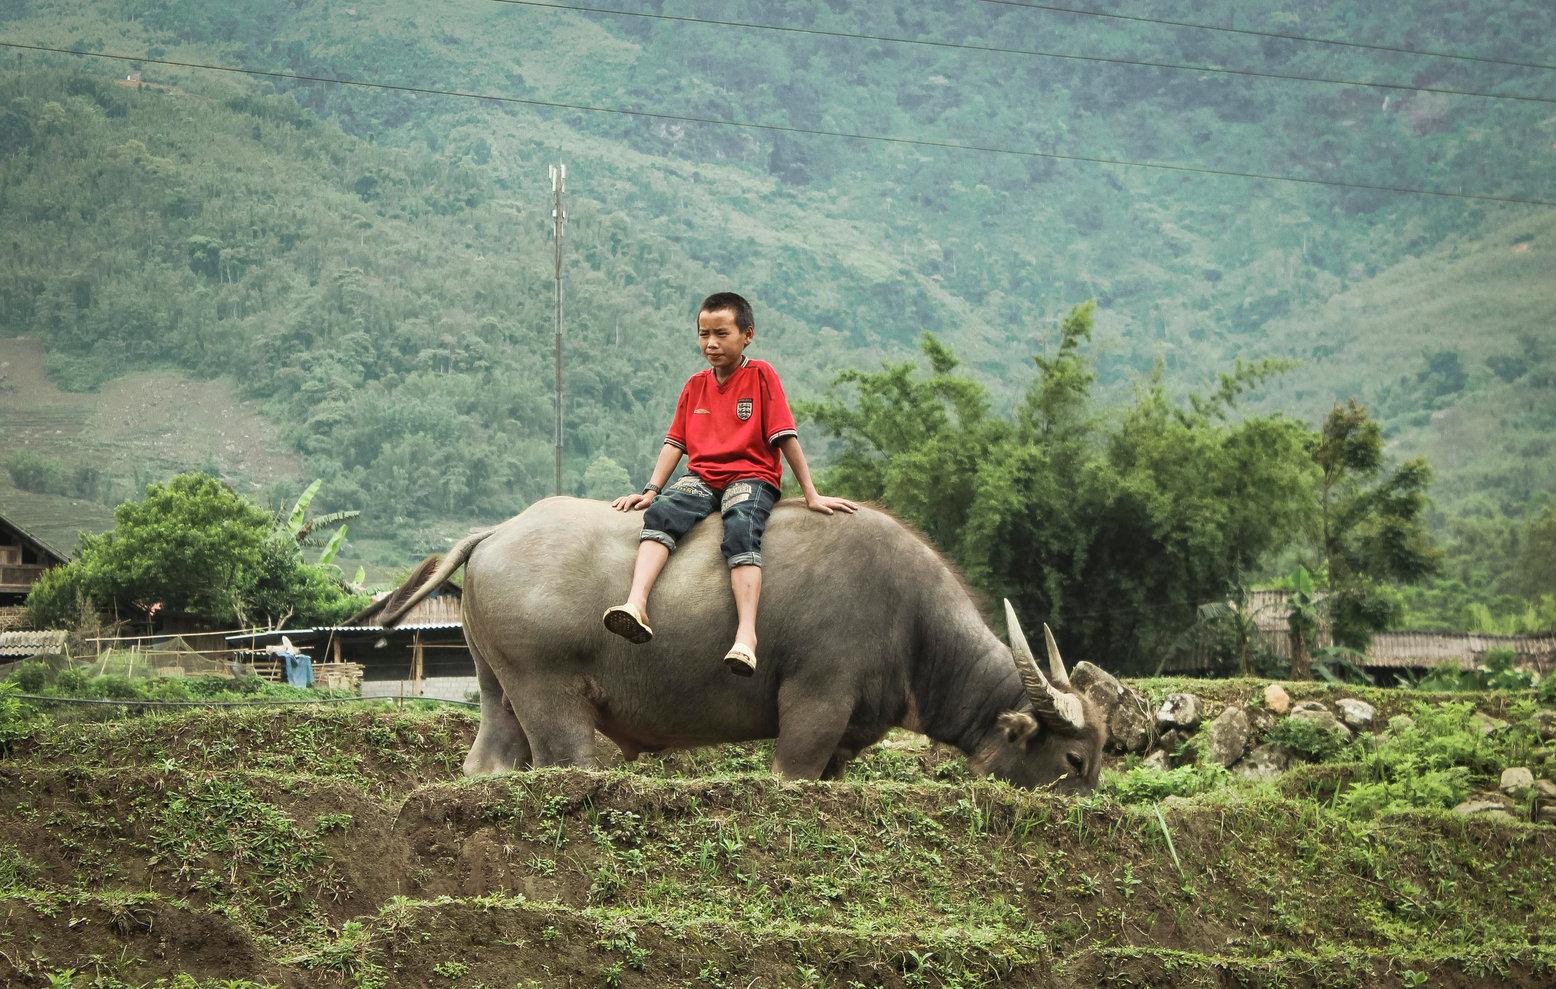 Niño sentado en un búfalo - Vietnam - Fo